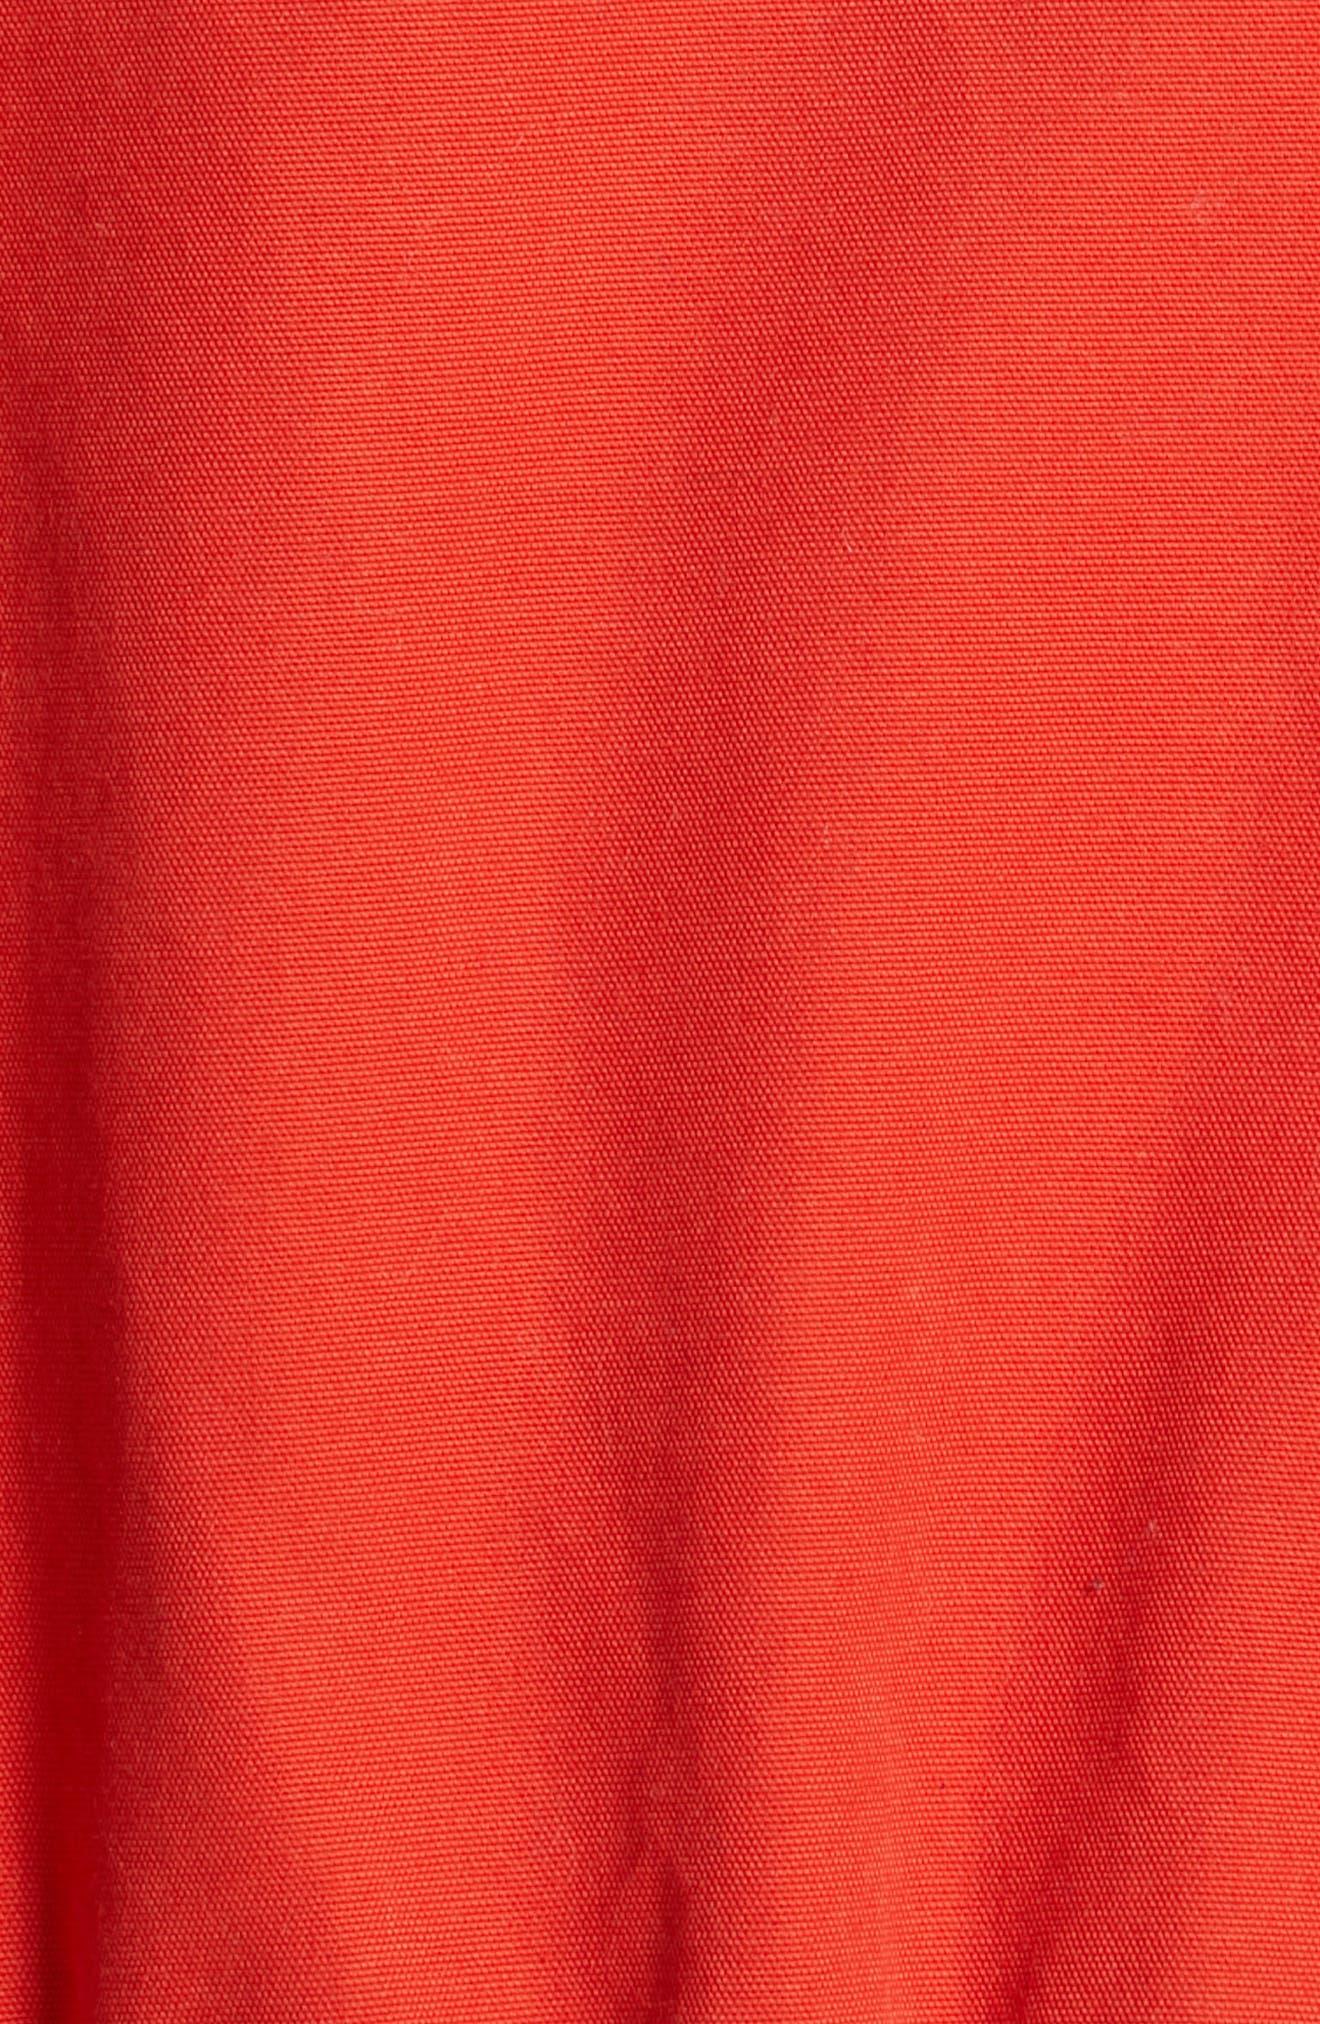 POLO RALPH LAUREN, Colorblock Utility Jacket, Alternate thumbnail 7, color, ORANGE/CREAM/ SAPPHIRE